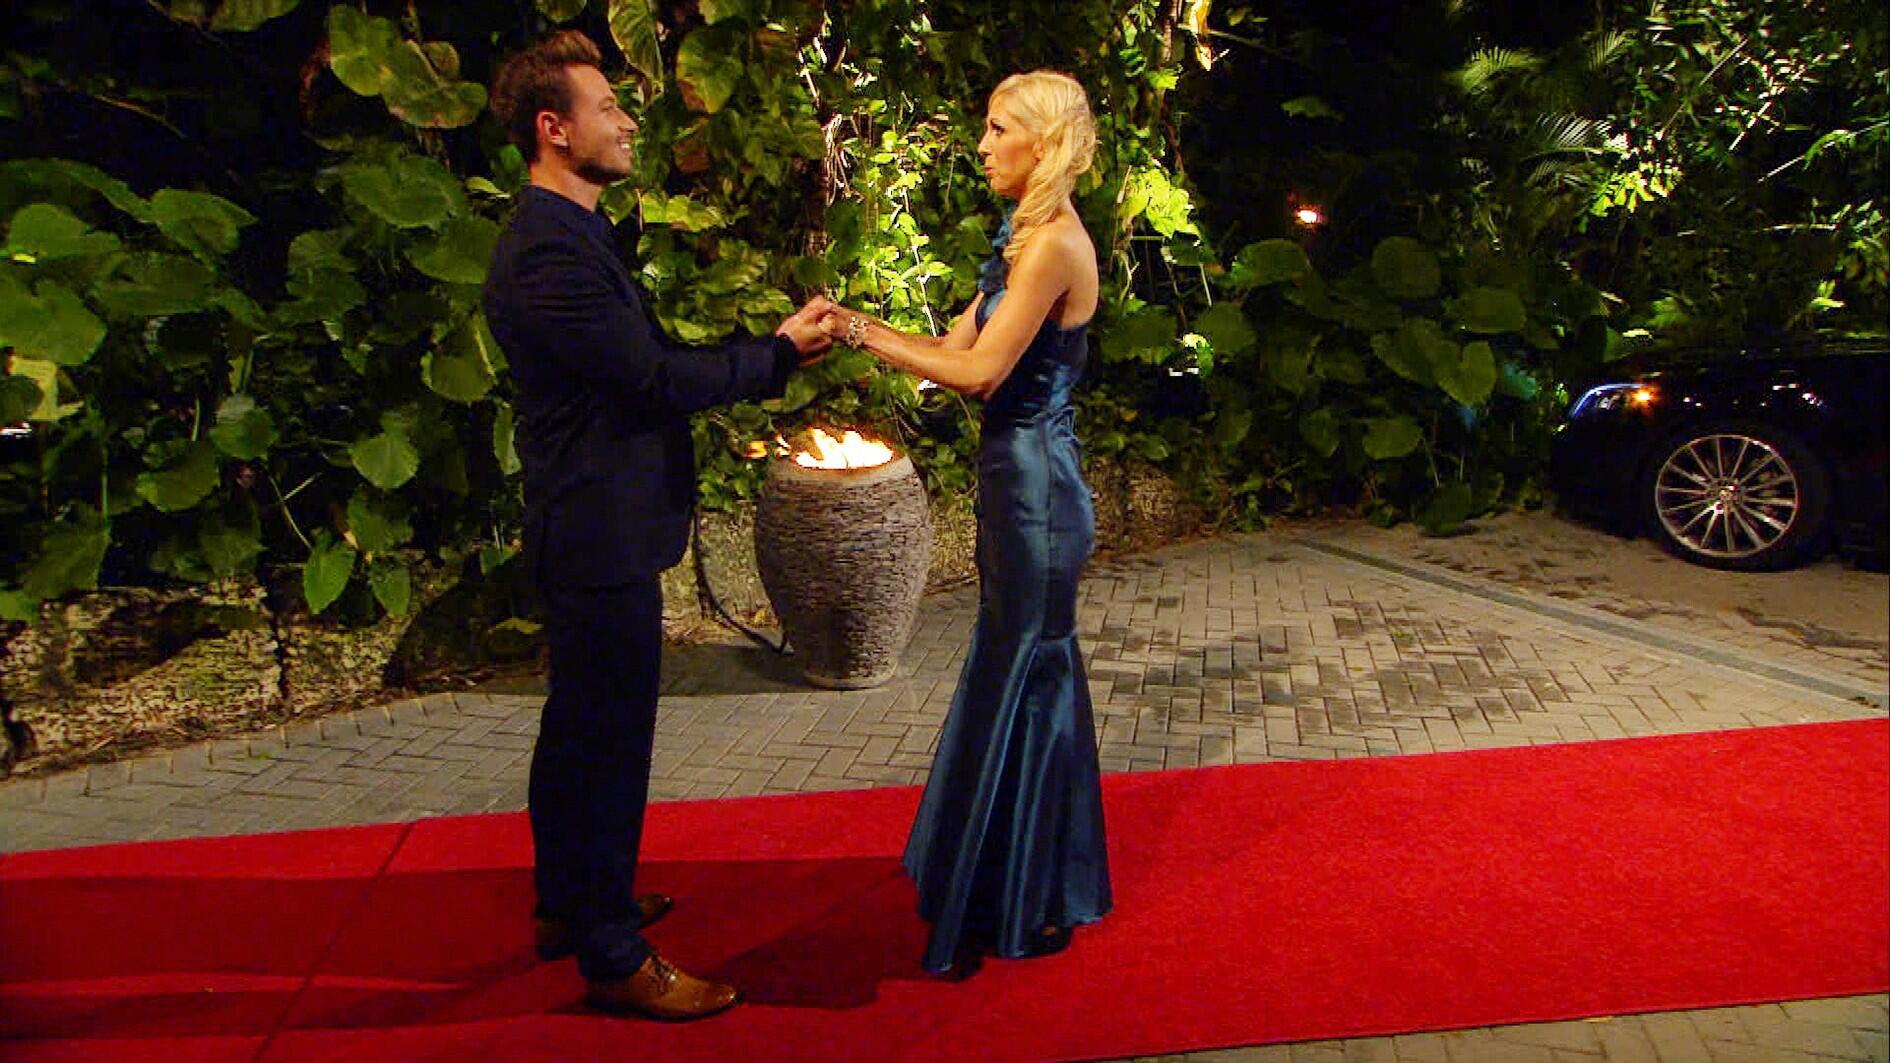 Bild zu Der Bachelor 2017, Sebastian Pannek, Folge 1, erste Nacht der Rosen